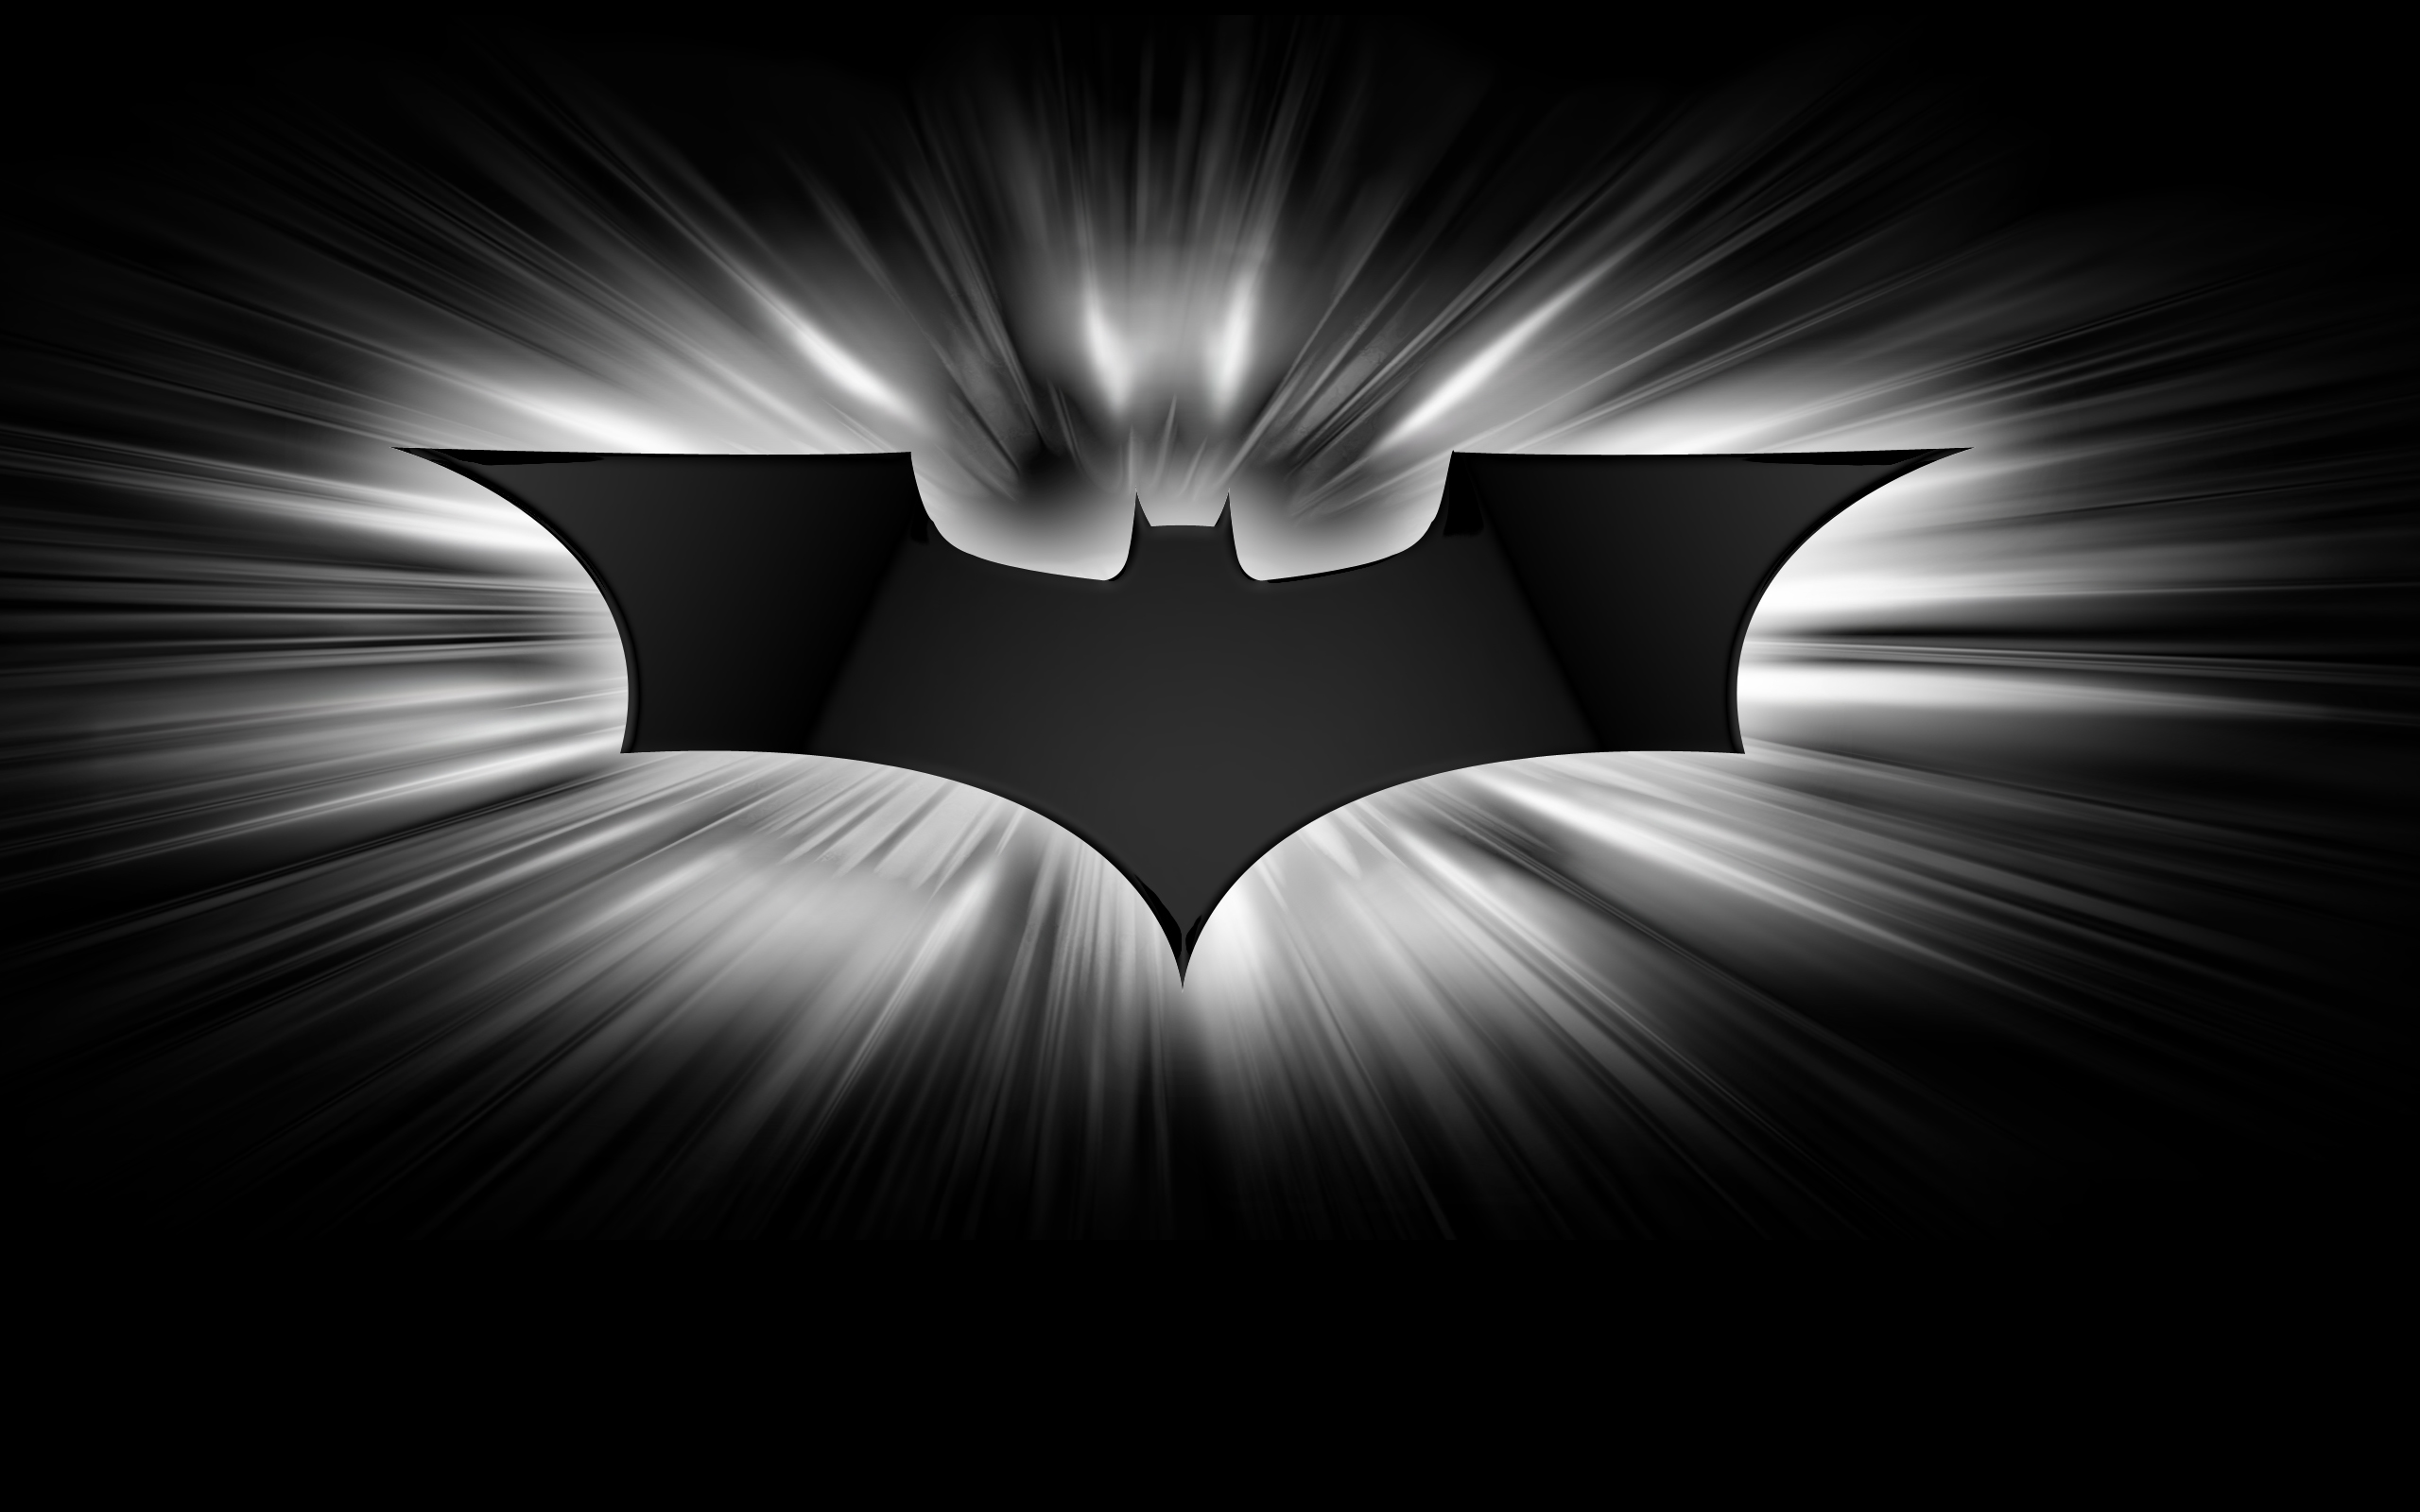 dark knight download free full movie